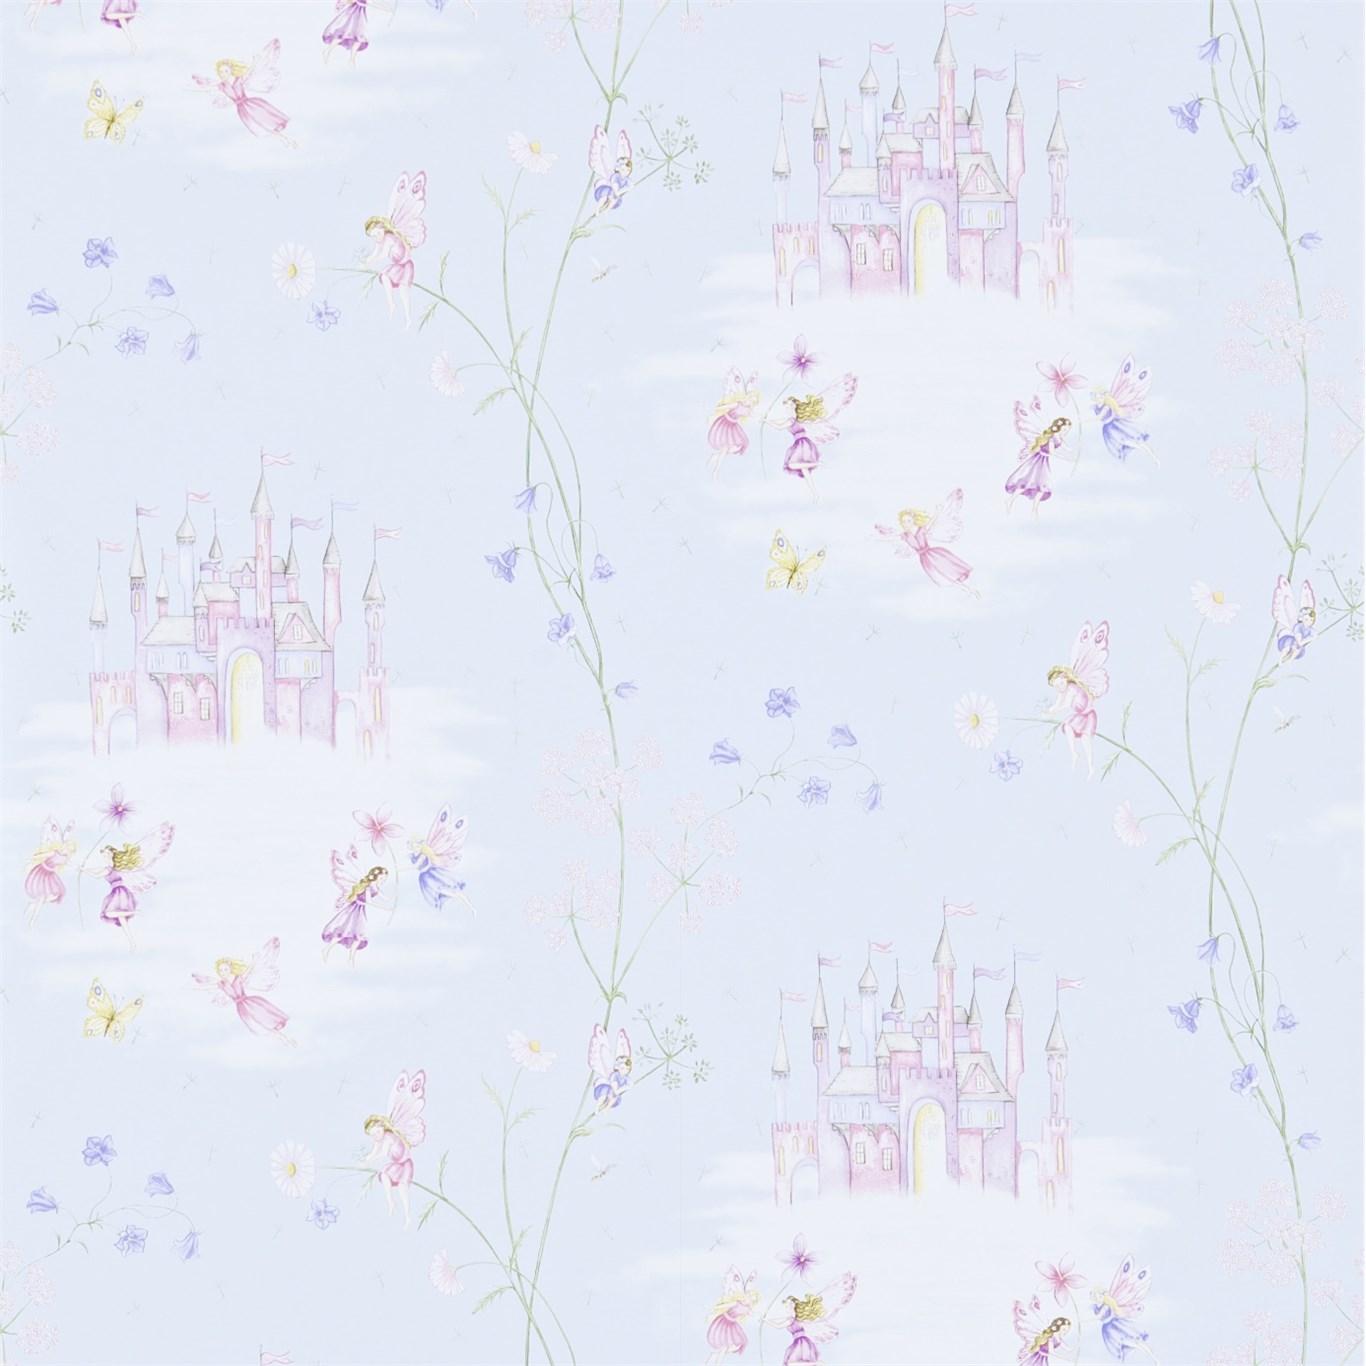 Abracazoo Wallpapers